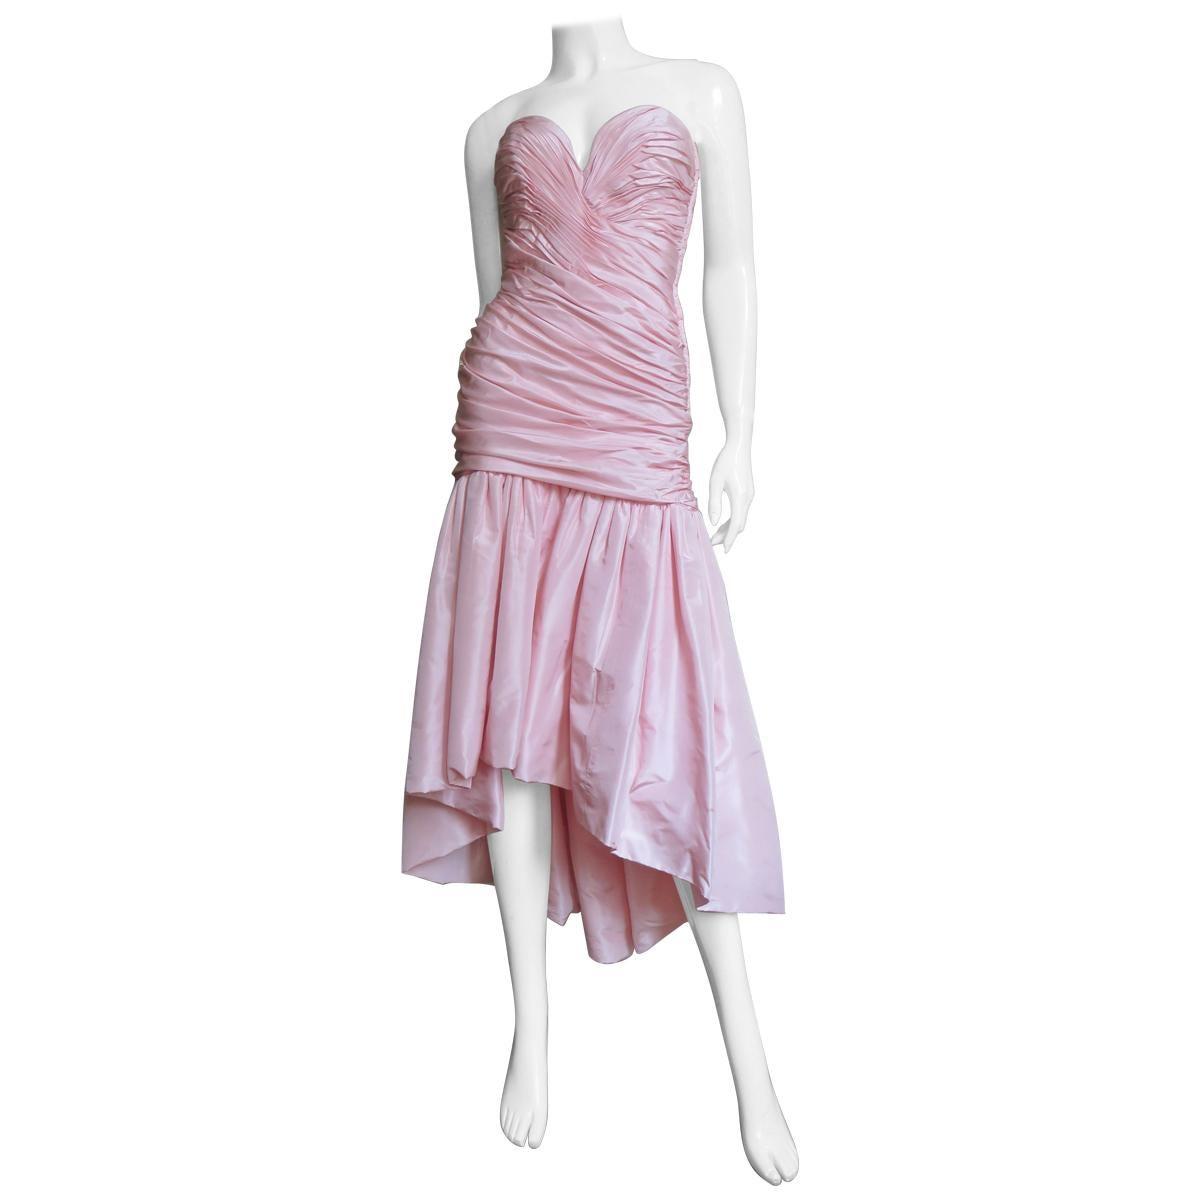 Vicky Tiel Silk Strapless High Low Bustier Dress